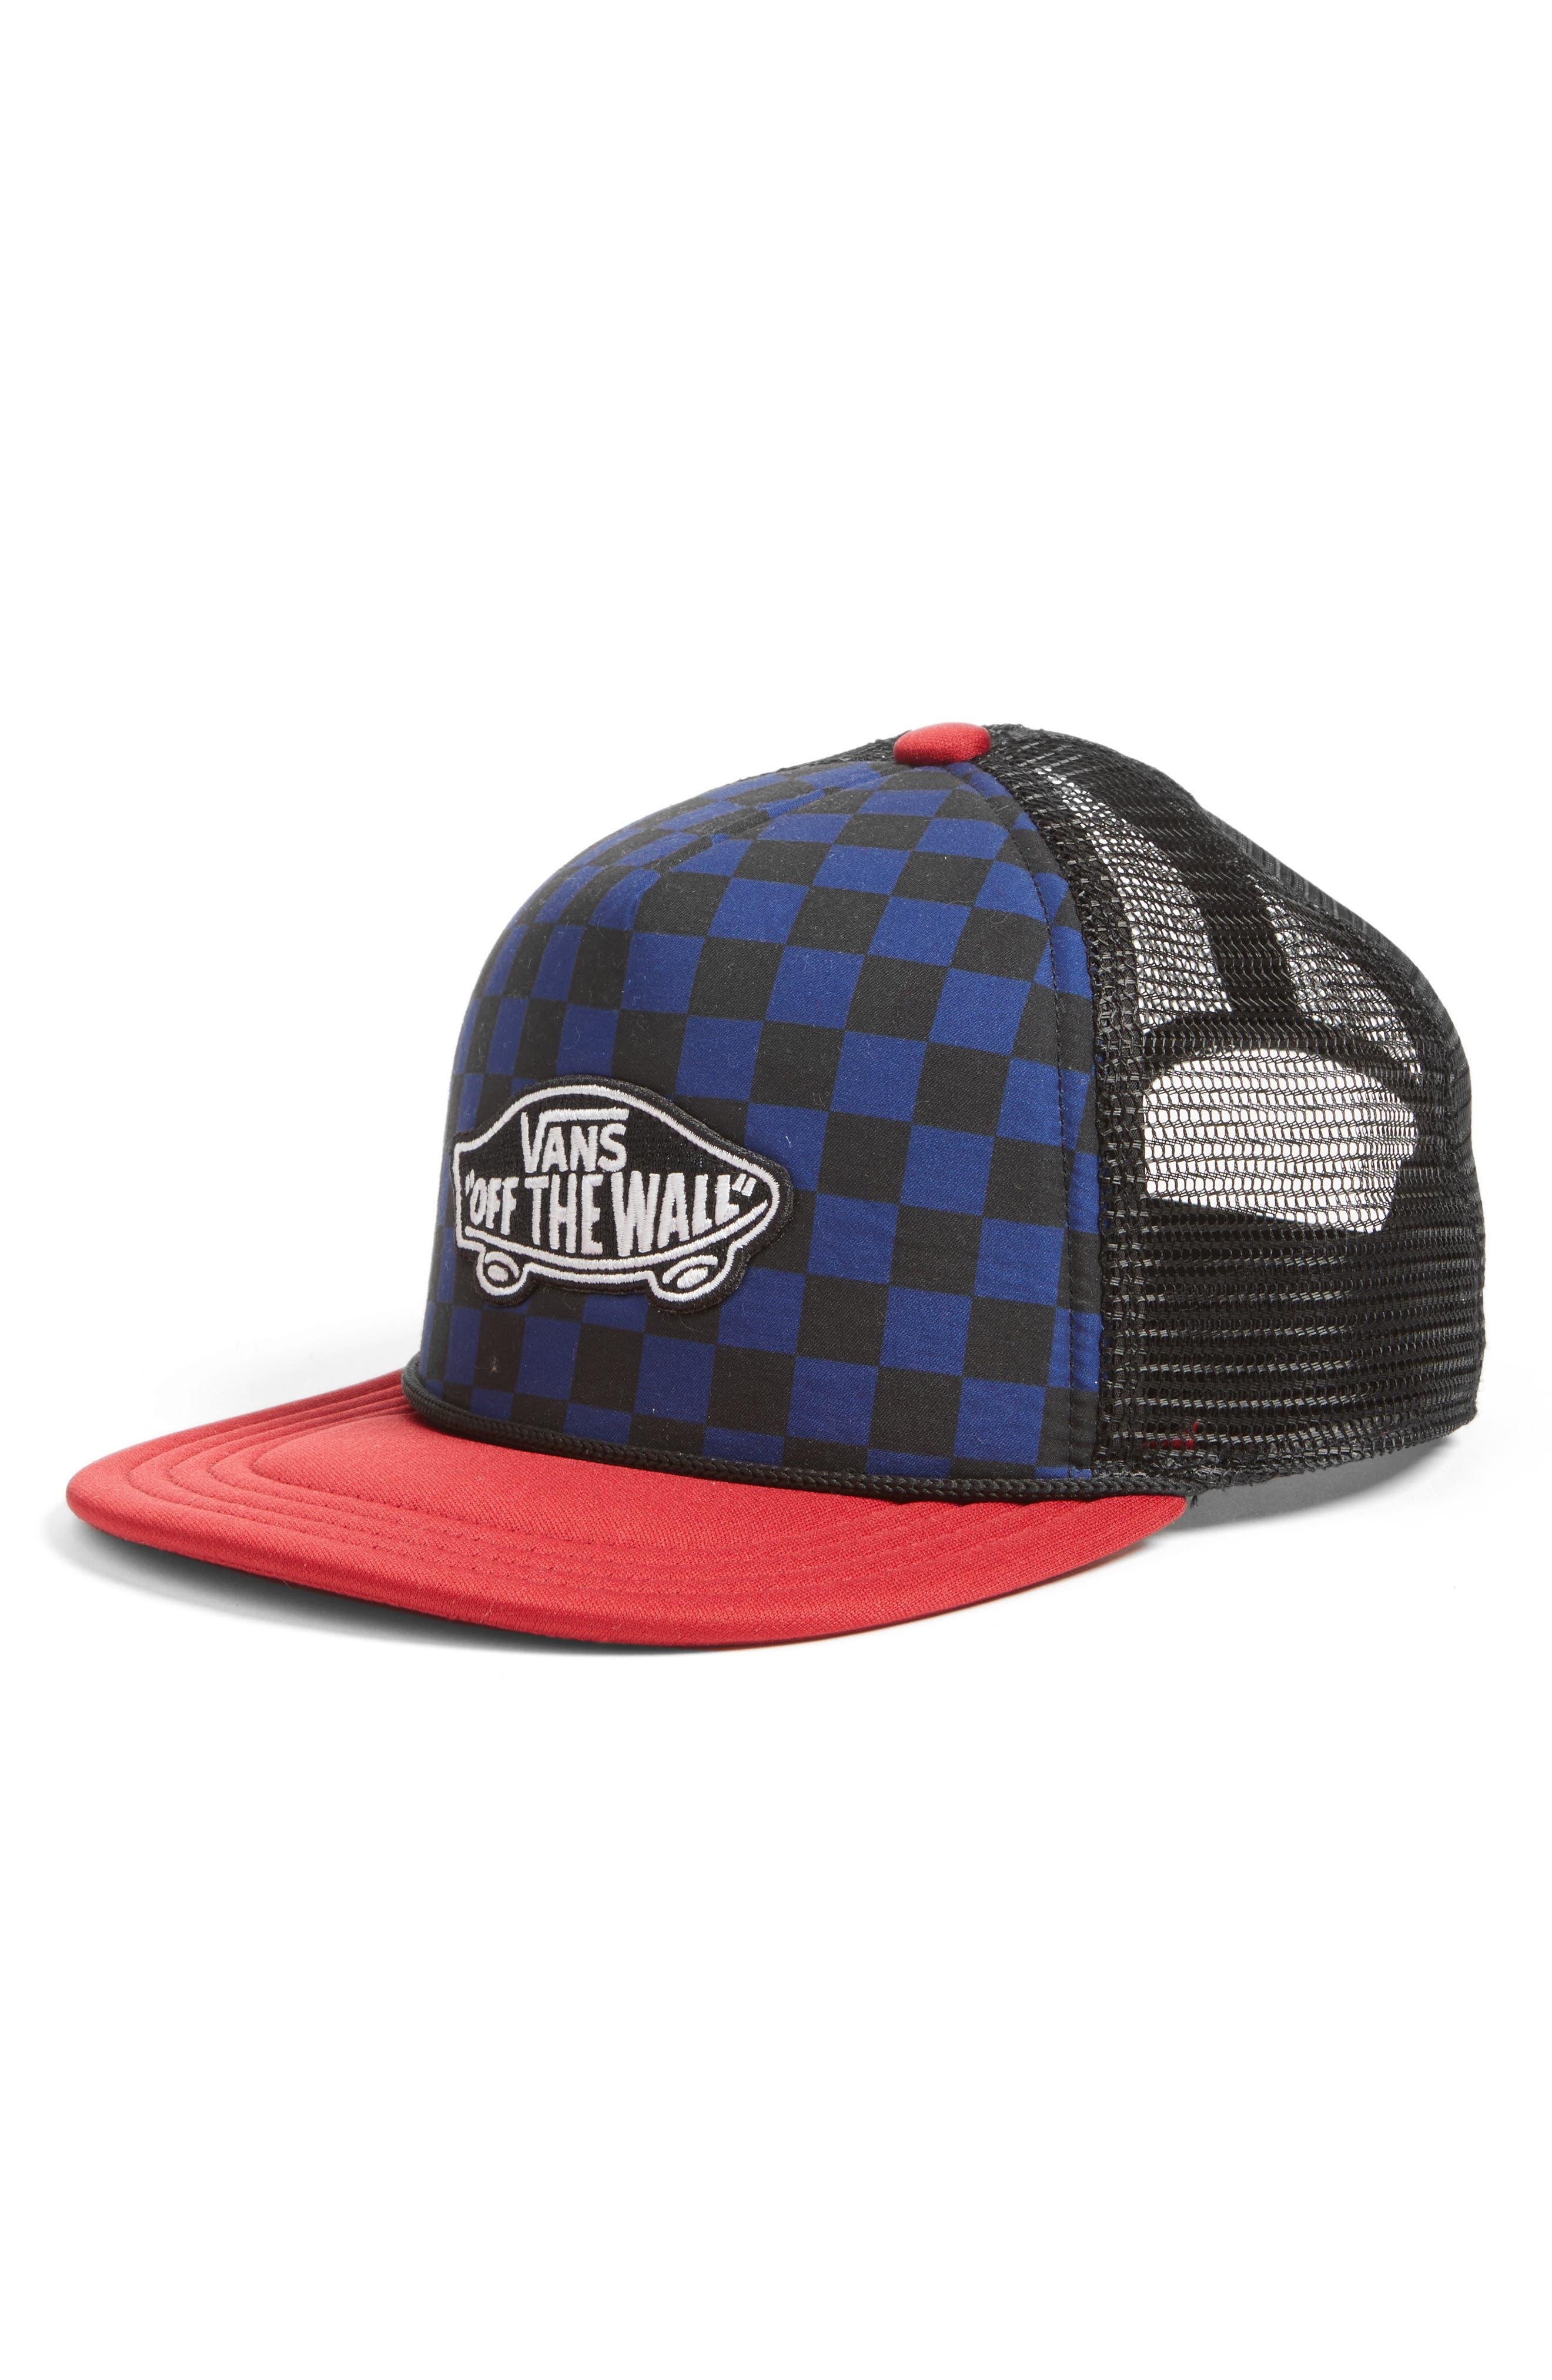 Alternate Image 1 Selected - Vans Classic Patch Trucker Hat (Big Boys)